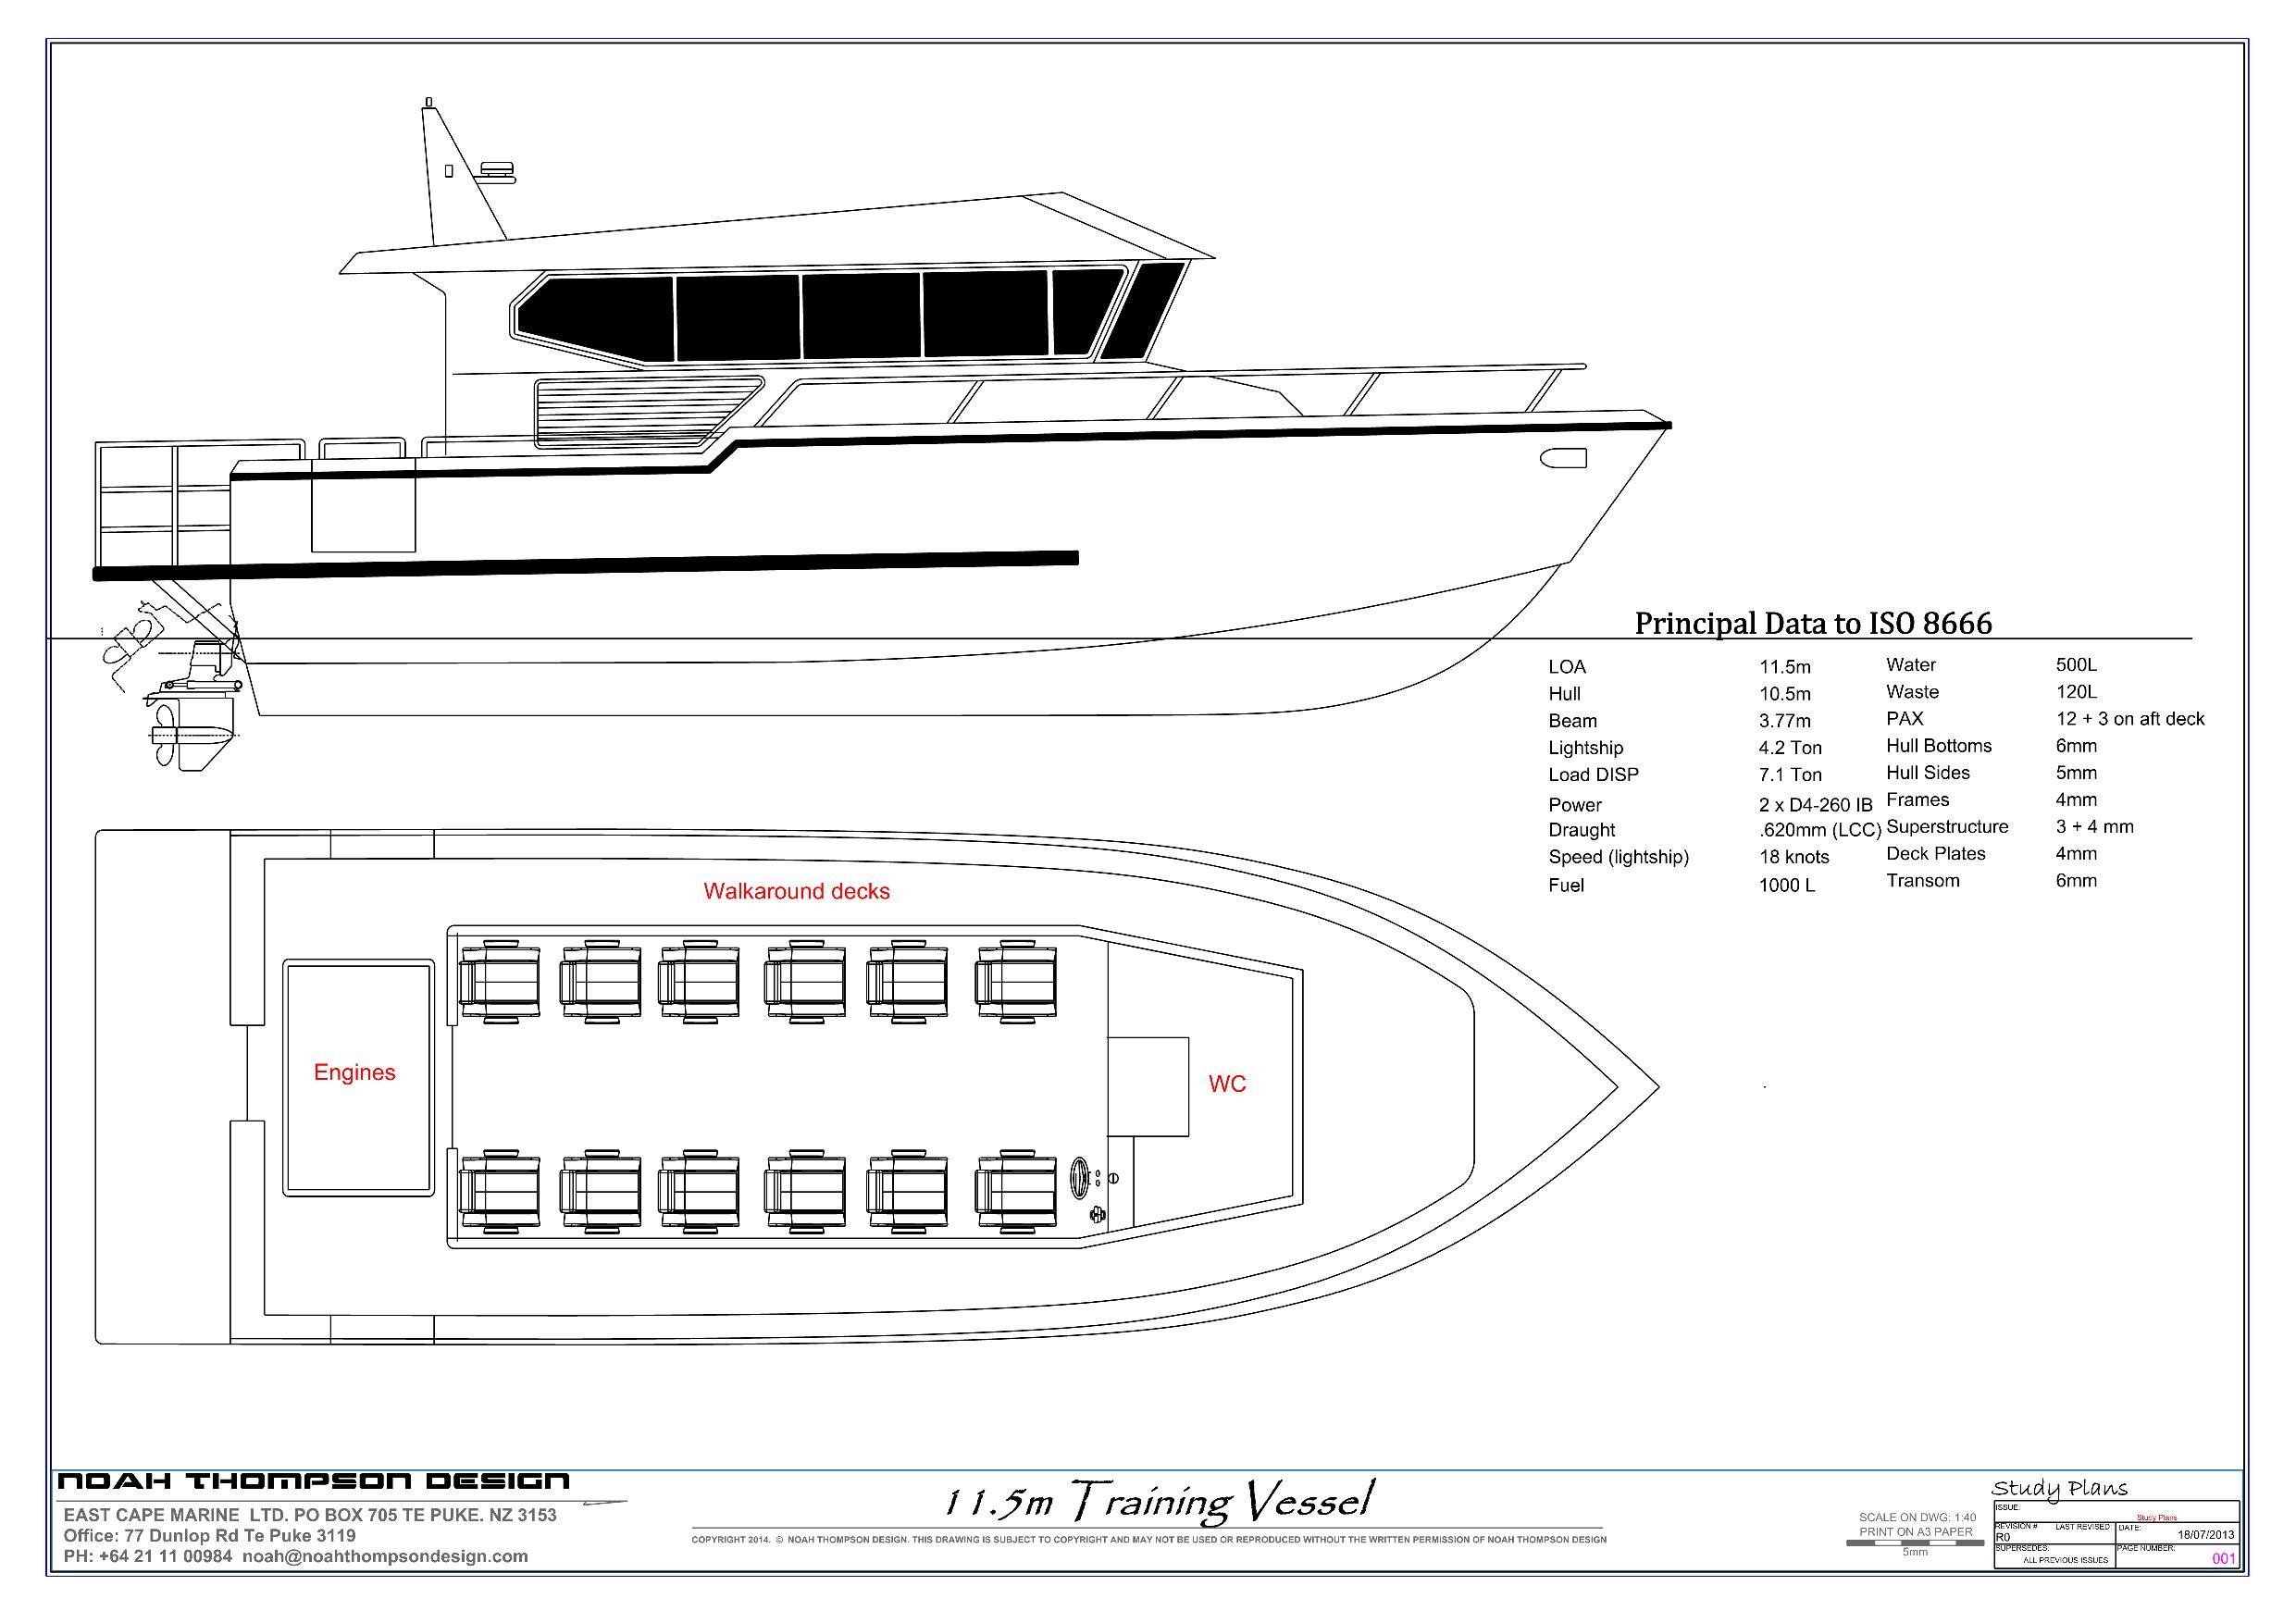 11.5m Training Vessel - NTD-4-5-14-page-001